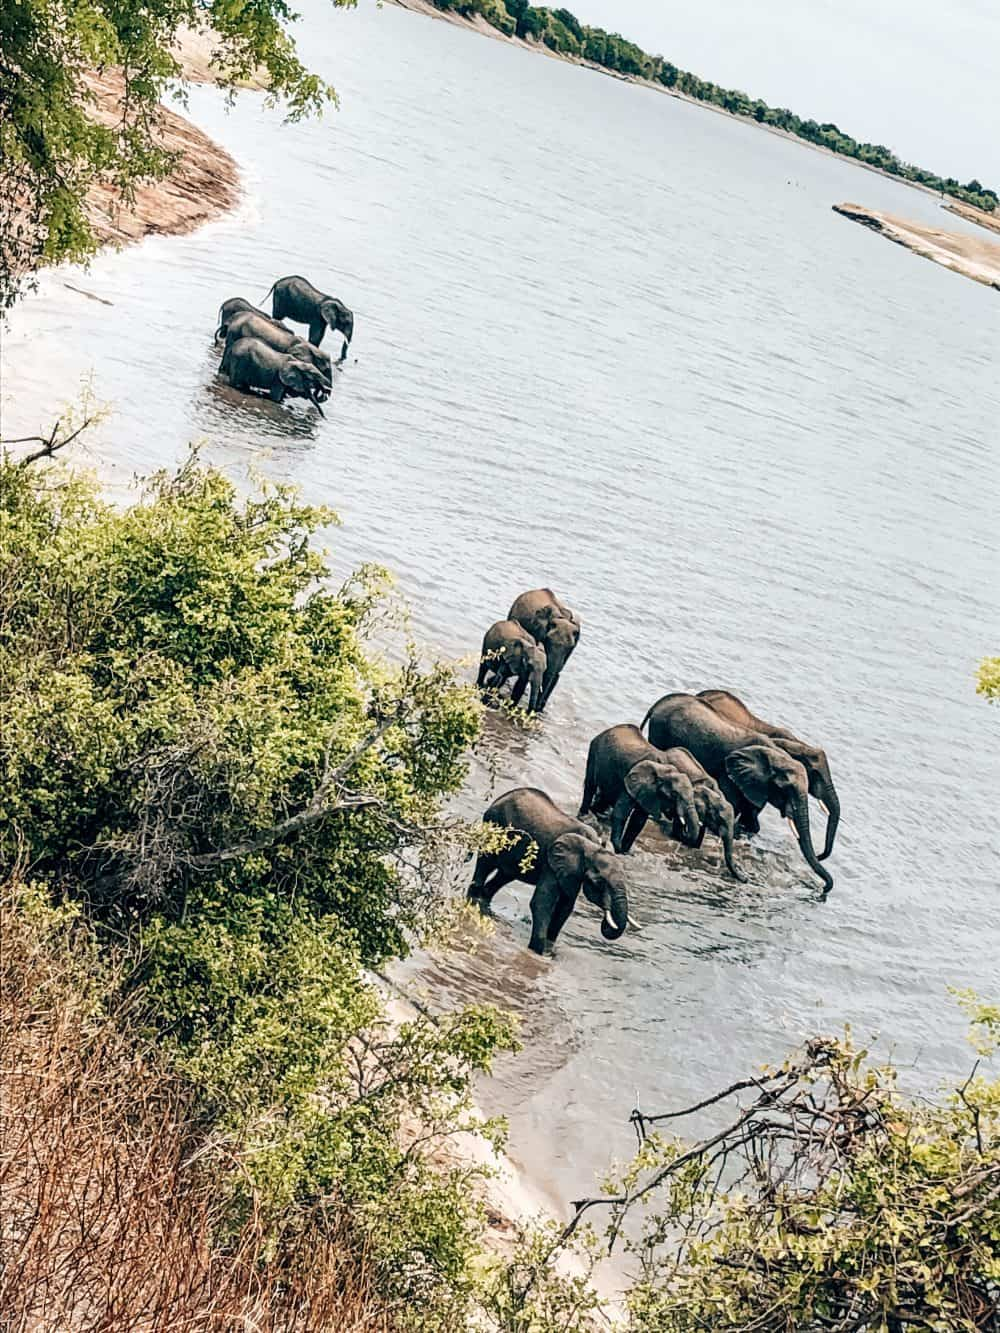 Elephants in the Chobe River, Botswana